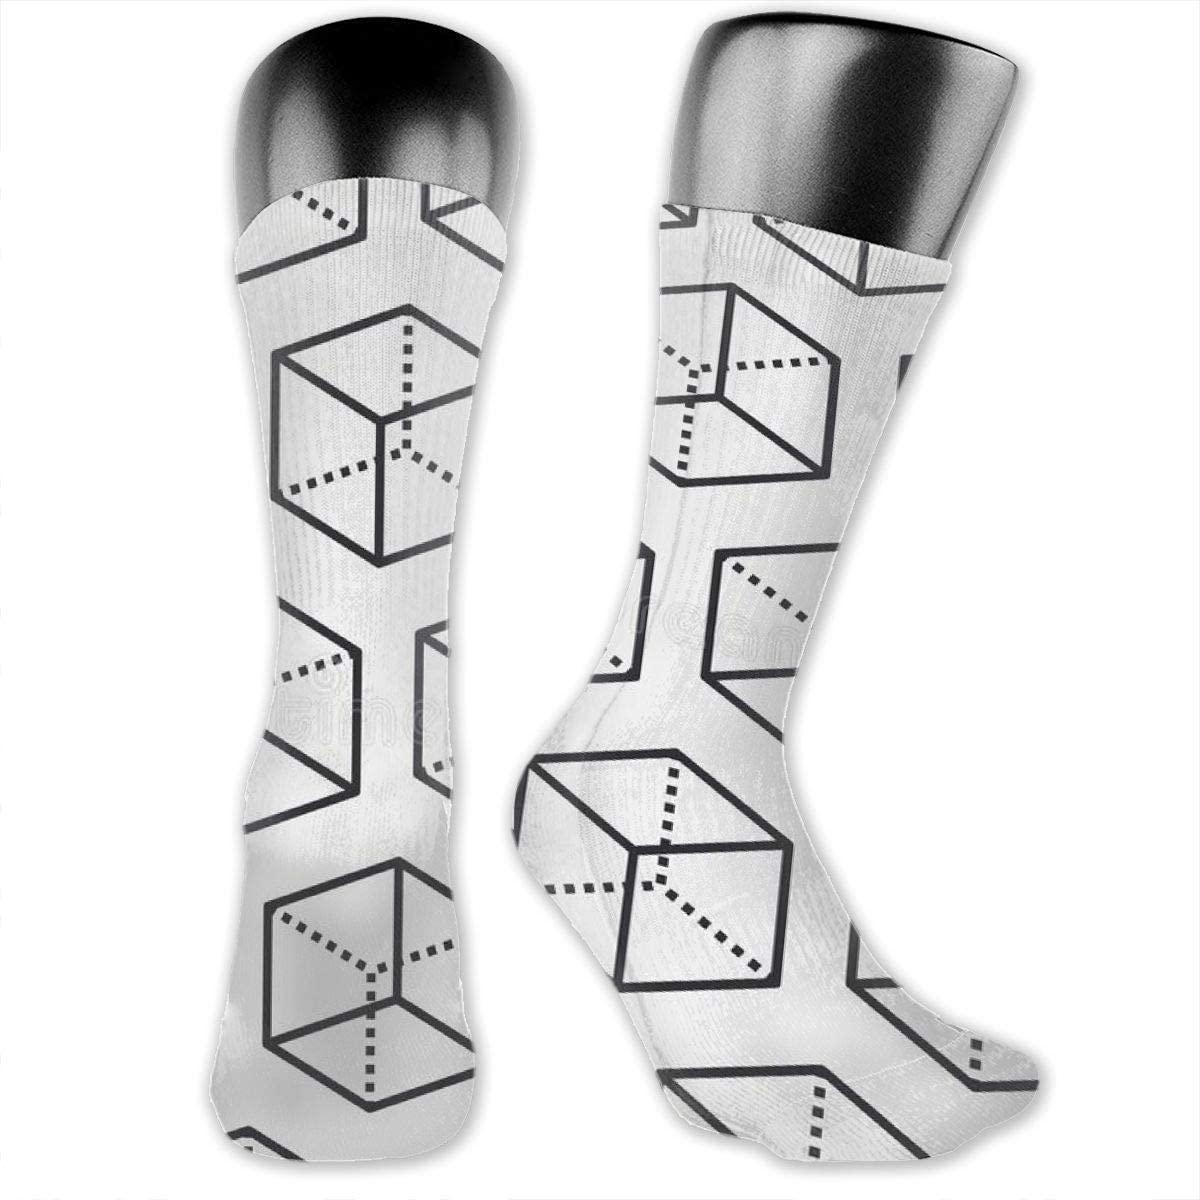 Fdeskaw 3d Math White Cube Black Frame Geometry Graphics Crazy Design Soft & Stretchy Novelty Crew Socks For Men, Women & Kids